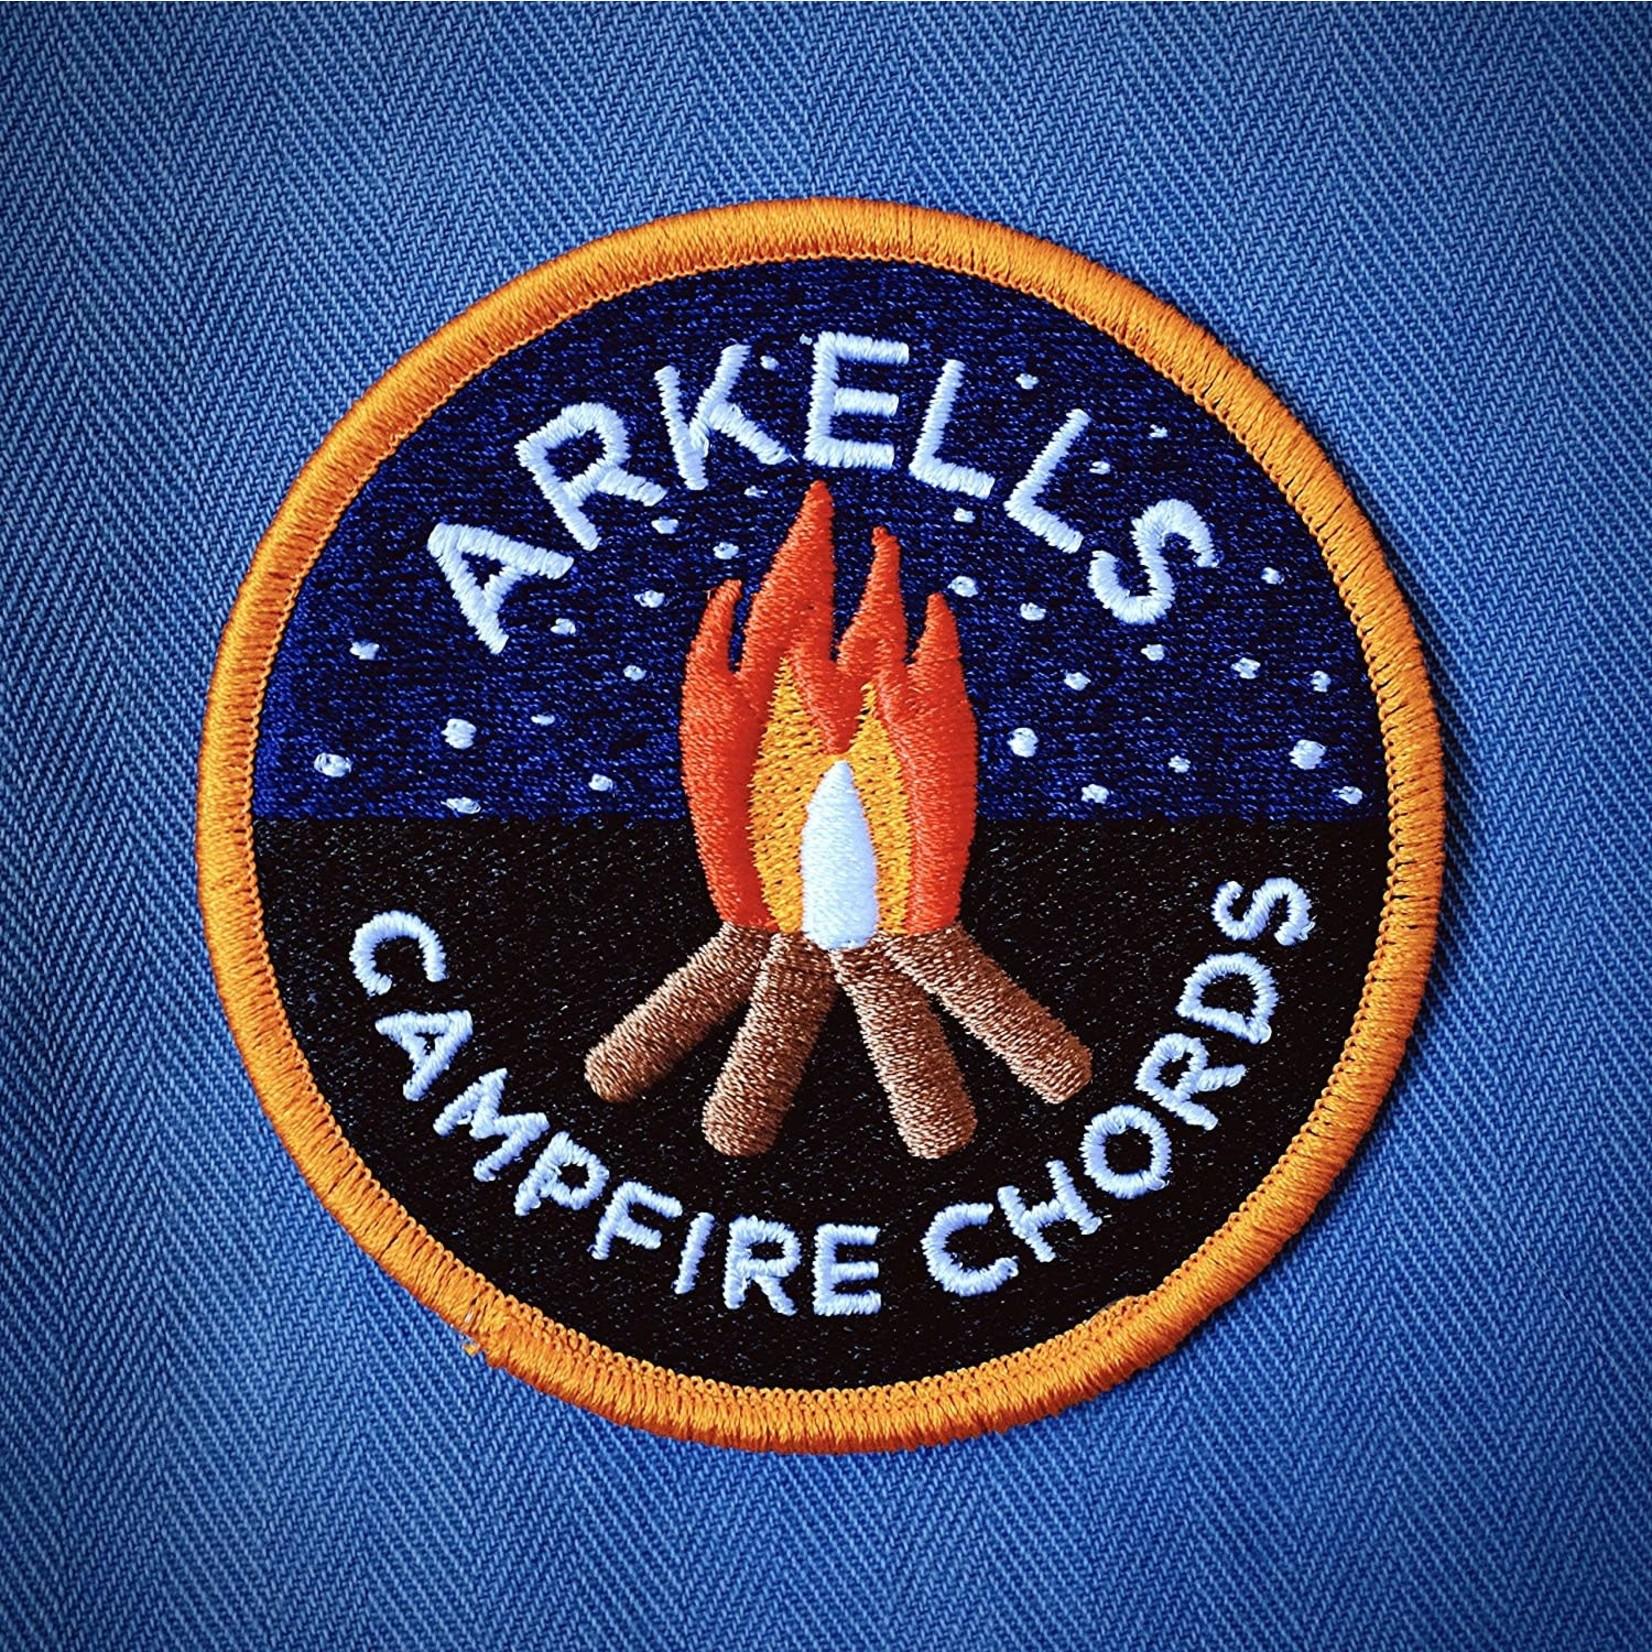 ARKELLS CAMPFIRE CHORDS (LP)